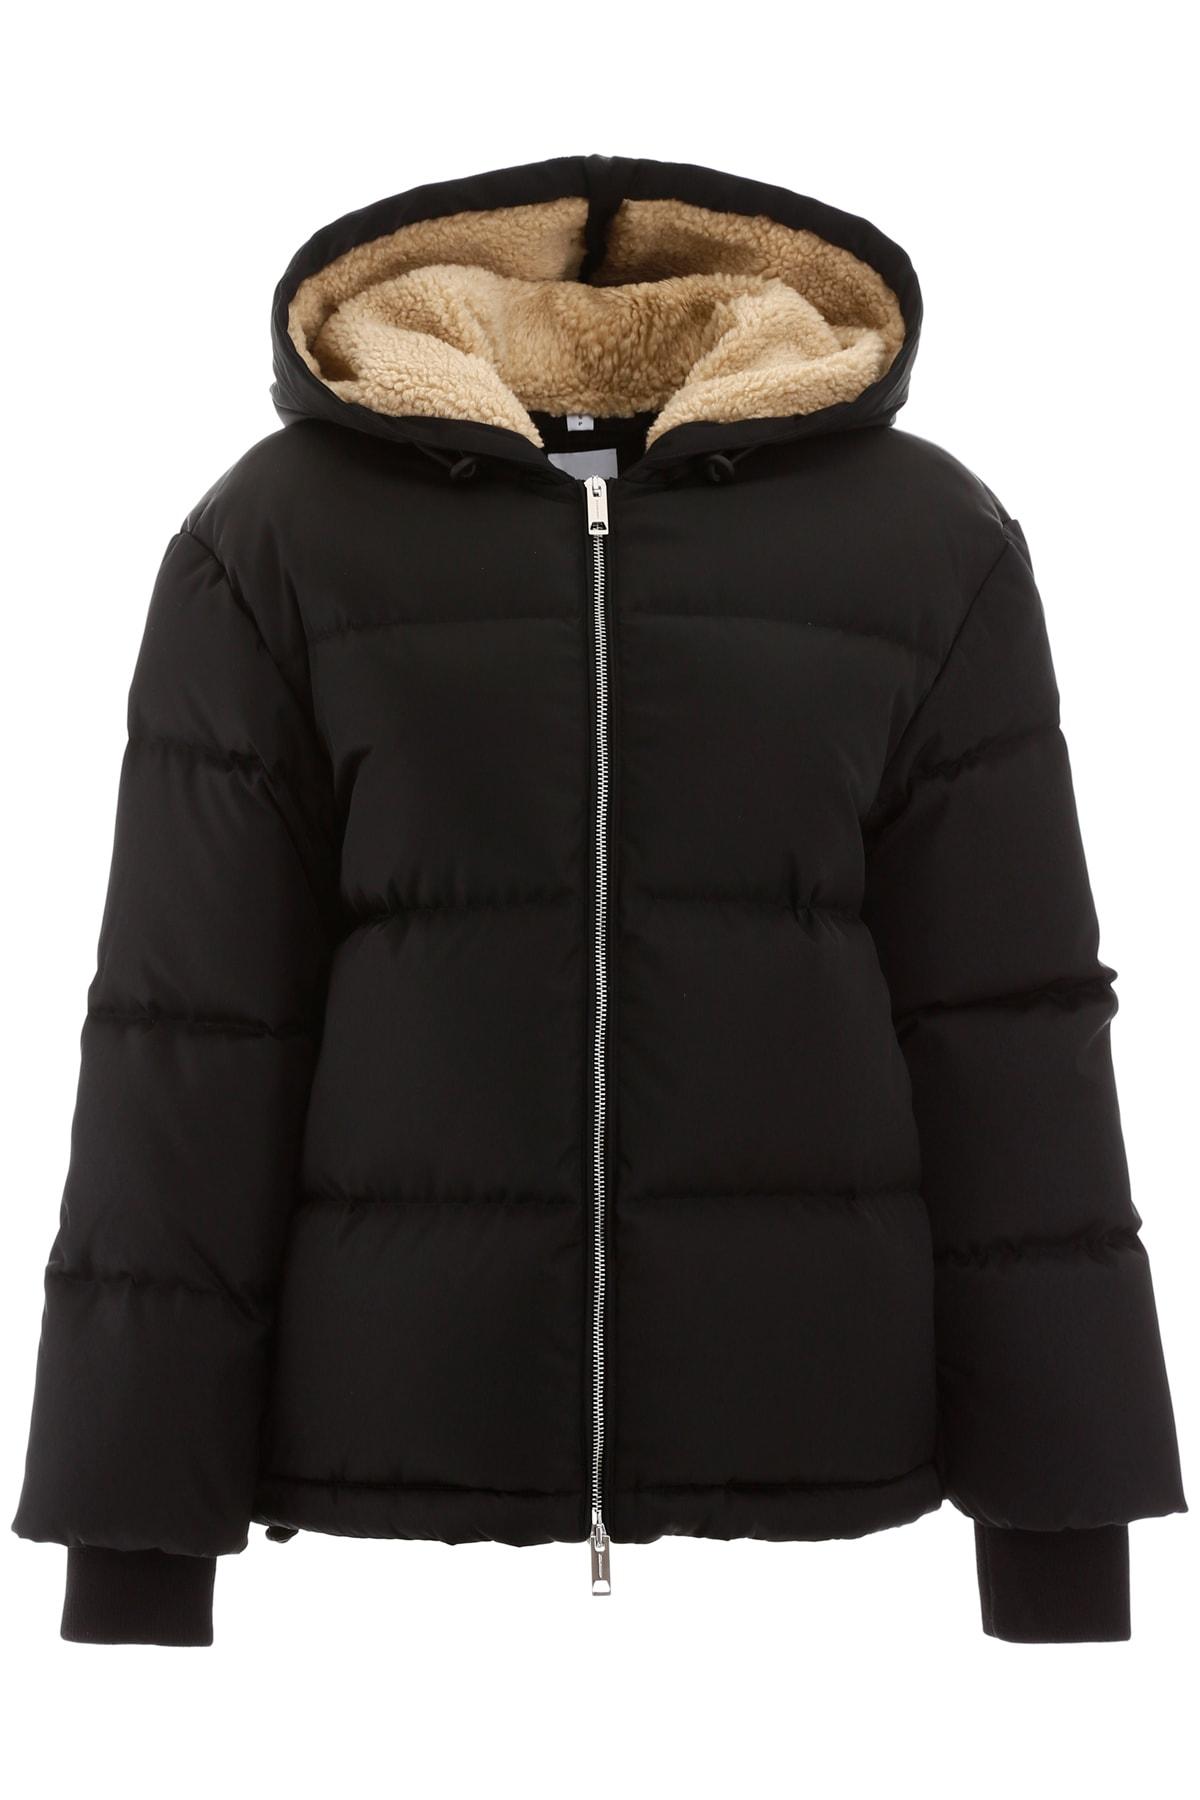 Burberry Seafield Puffer Jacket